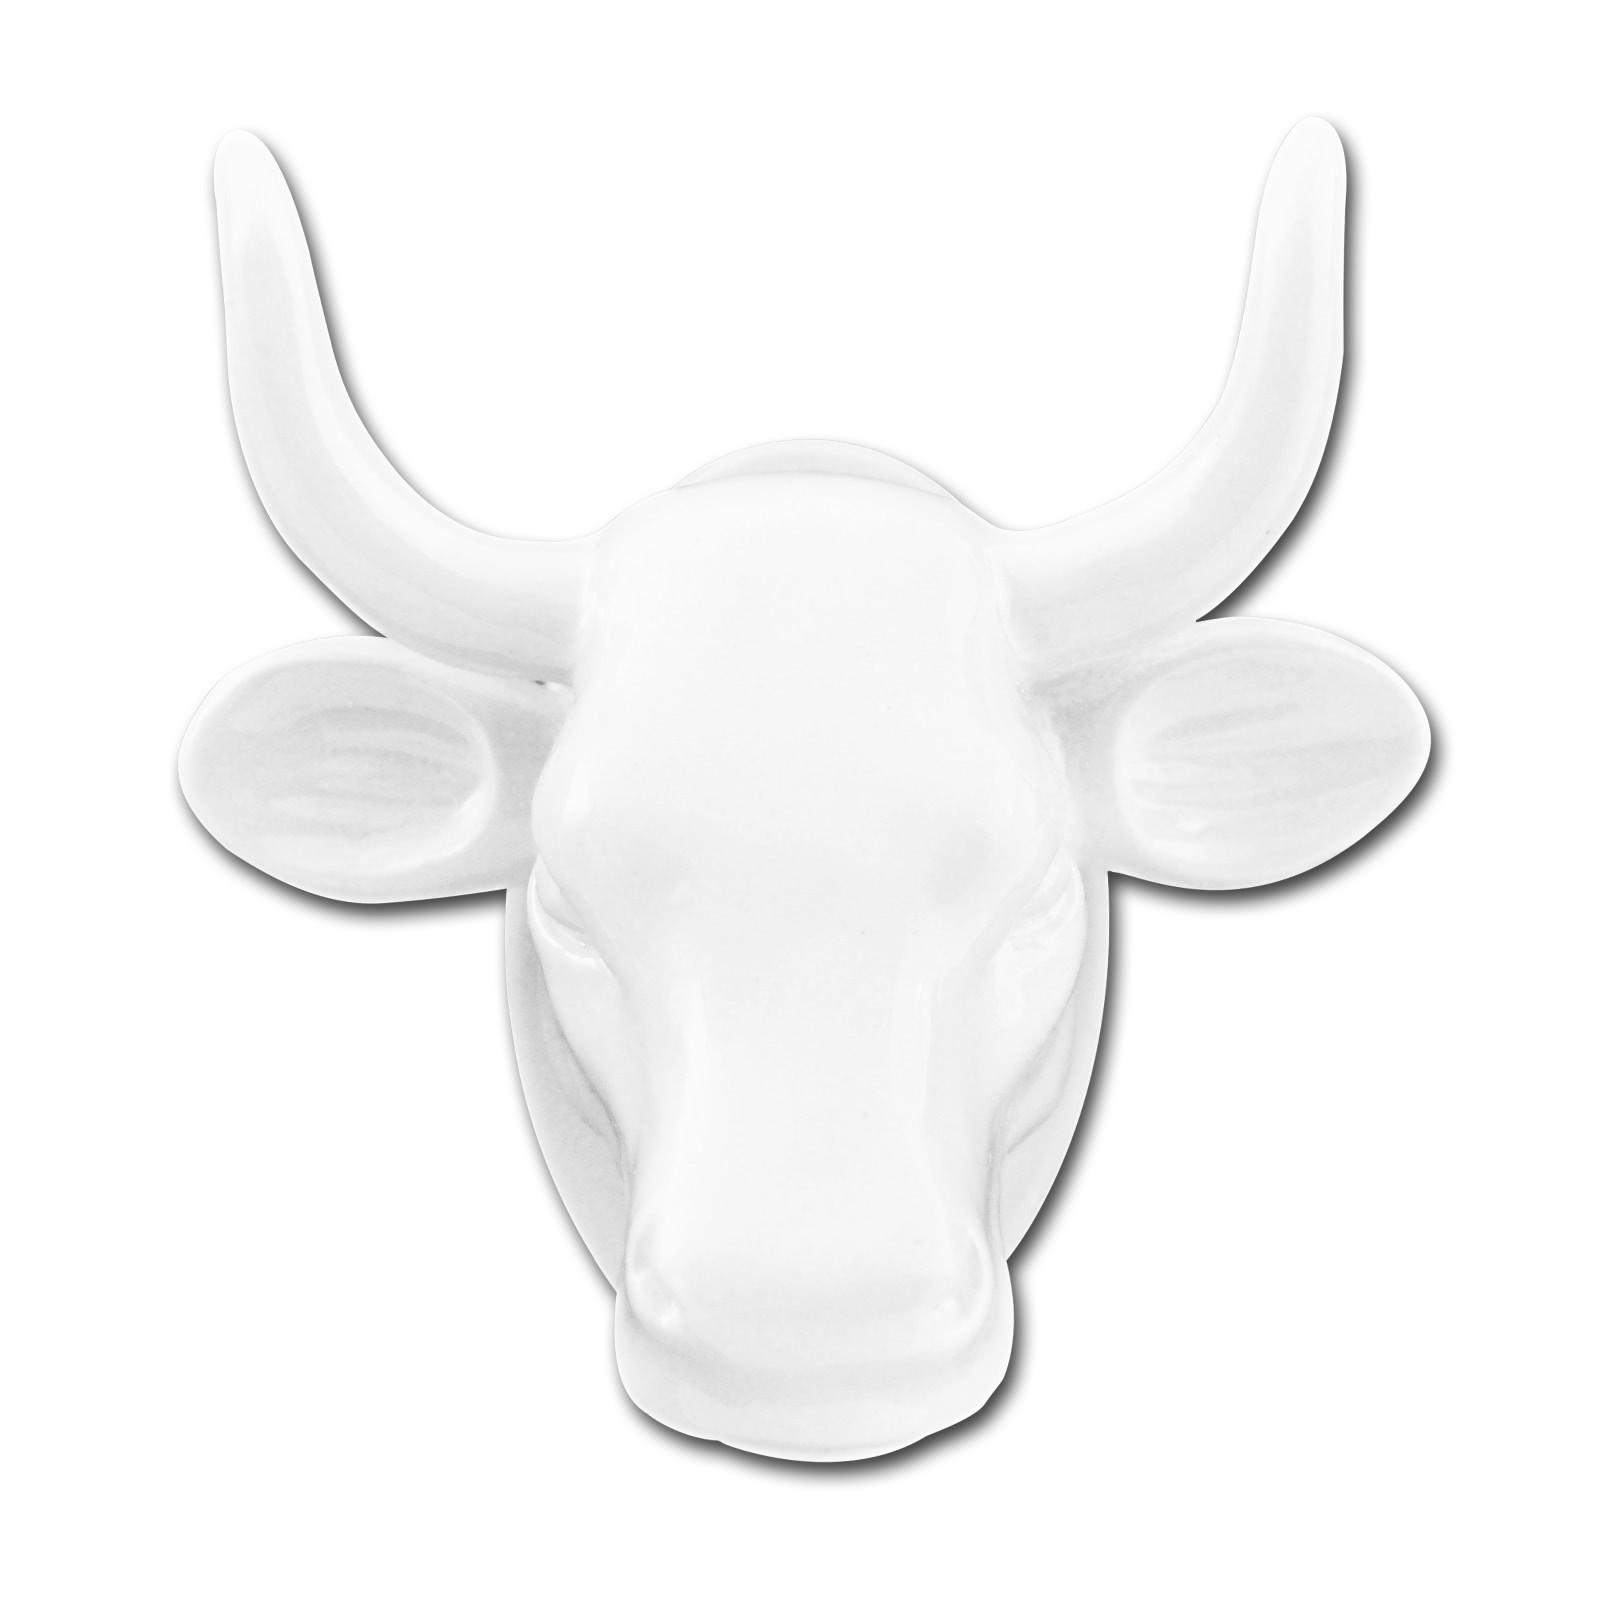 Magnet Kuh-Kopf weiß Kühlschrankmagnet Köthen Kuhparade KOS501W